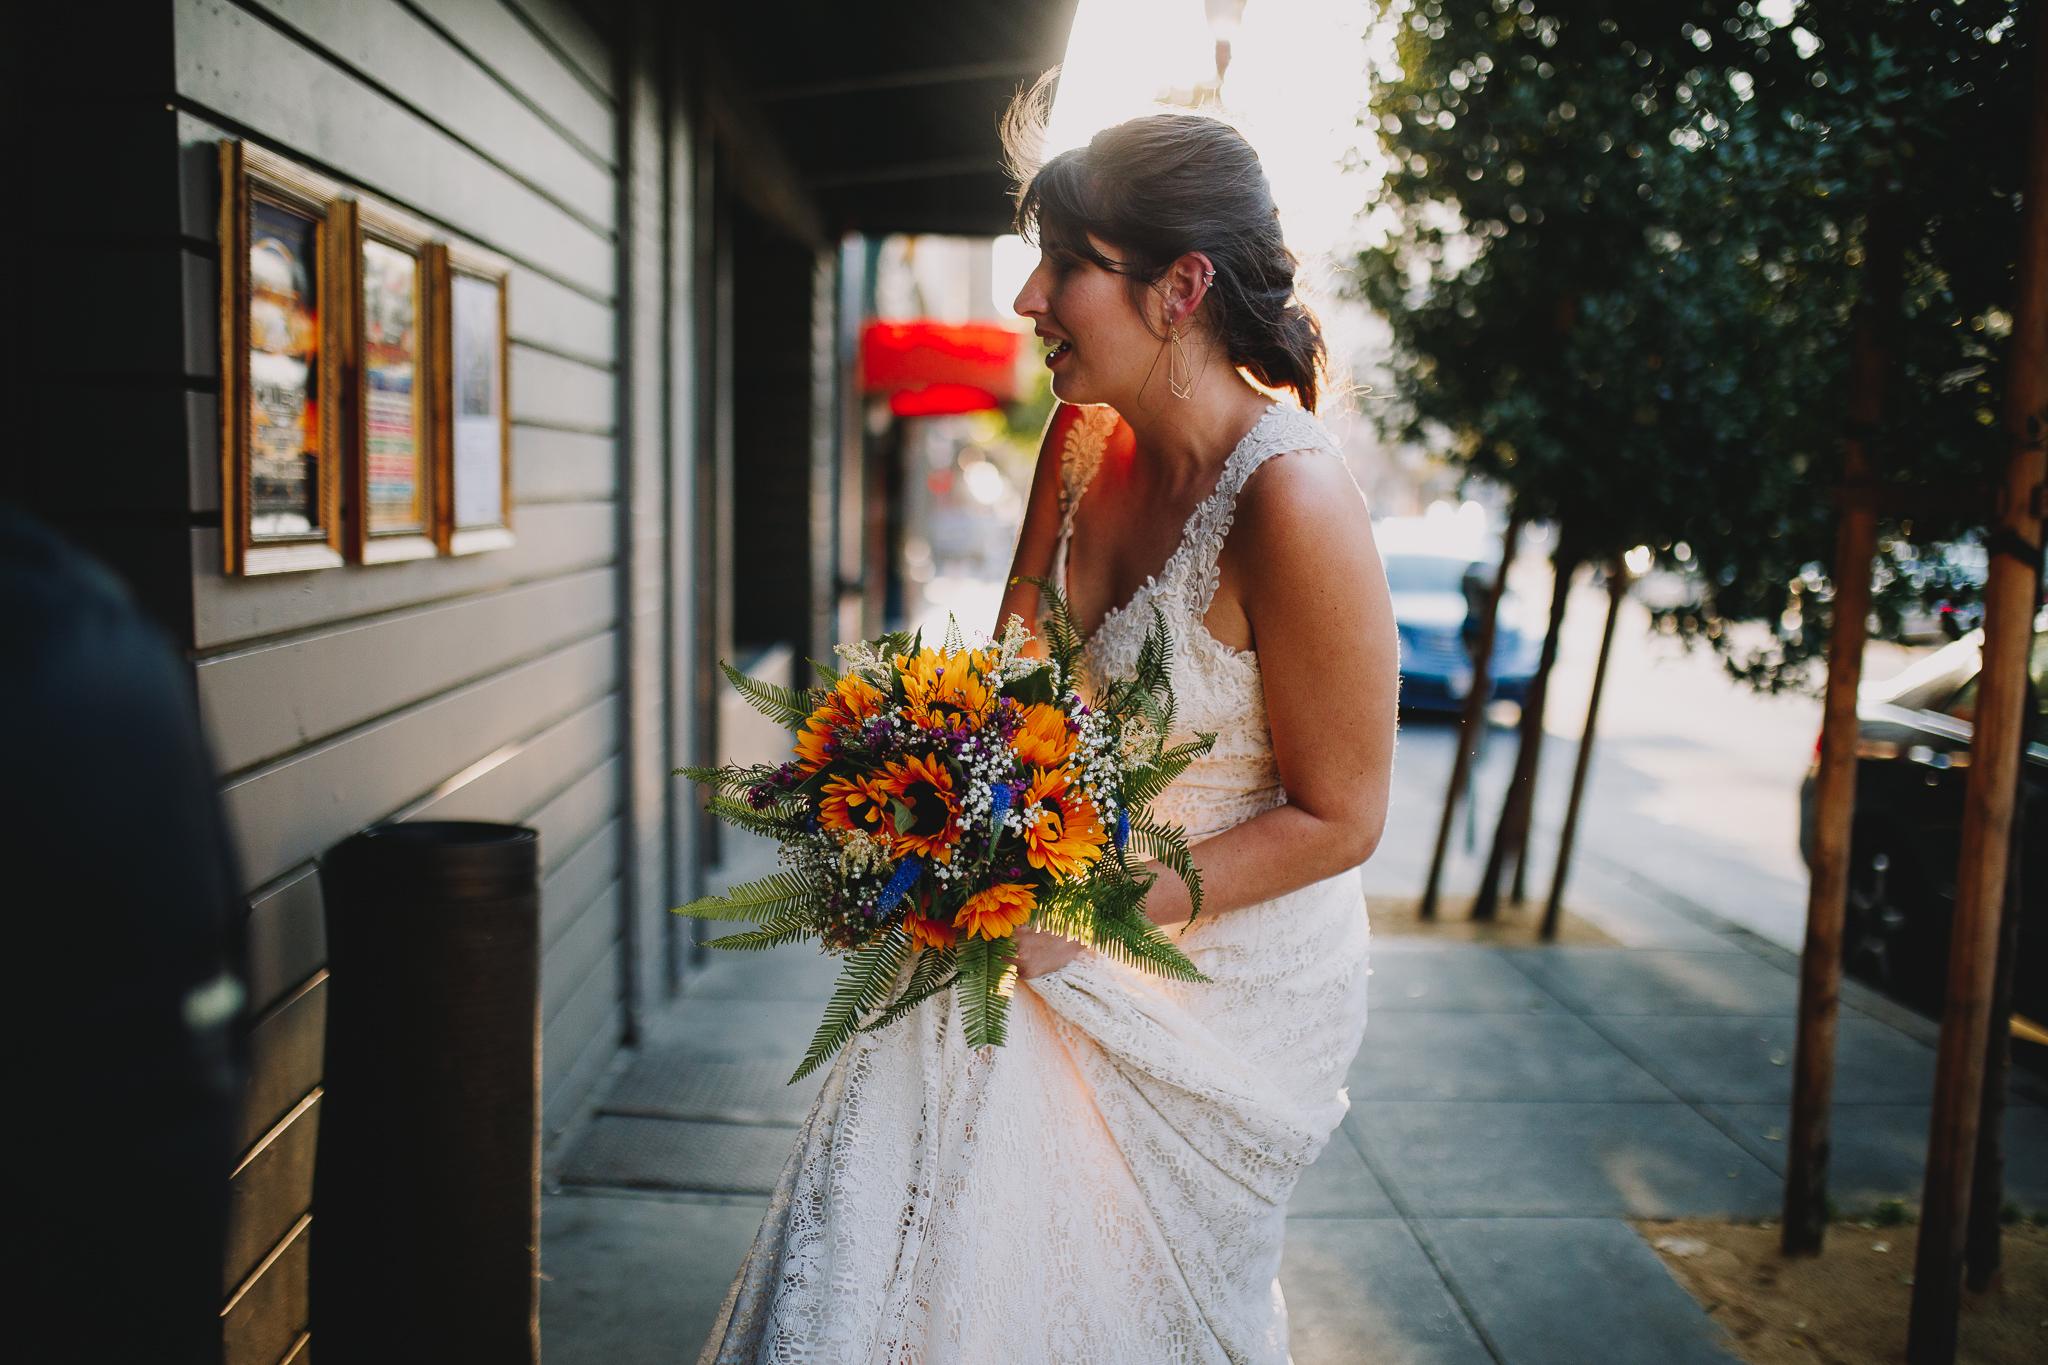 Archer Inspired Photography San Francisco Bay Area Wedding Lifestyle Documentary City Bar Photographer-12.jpg